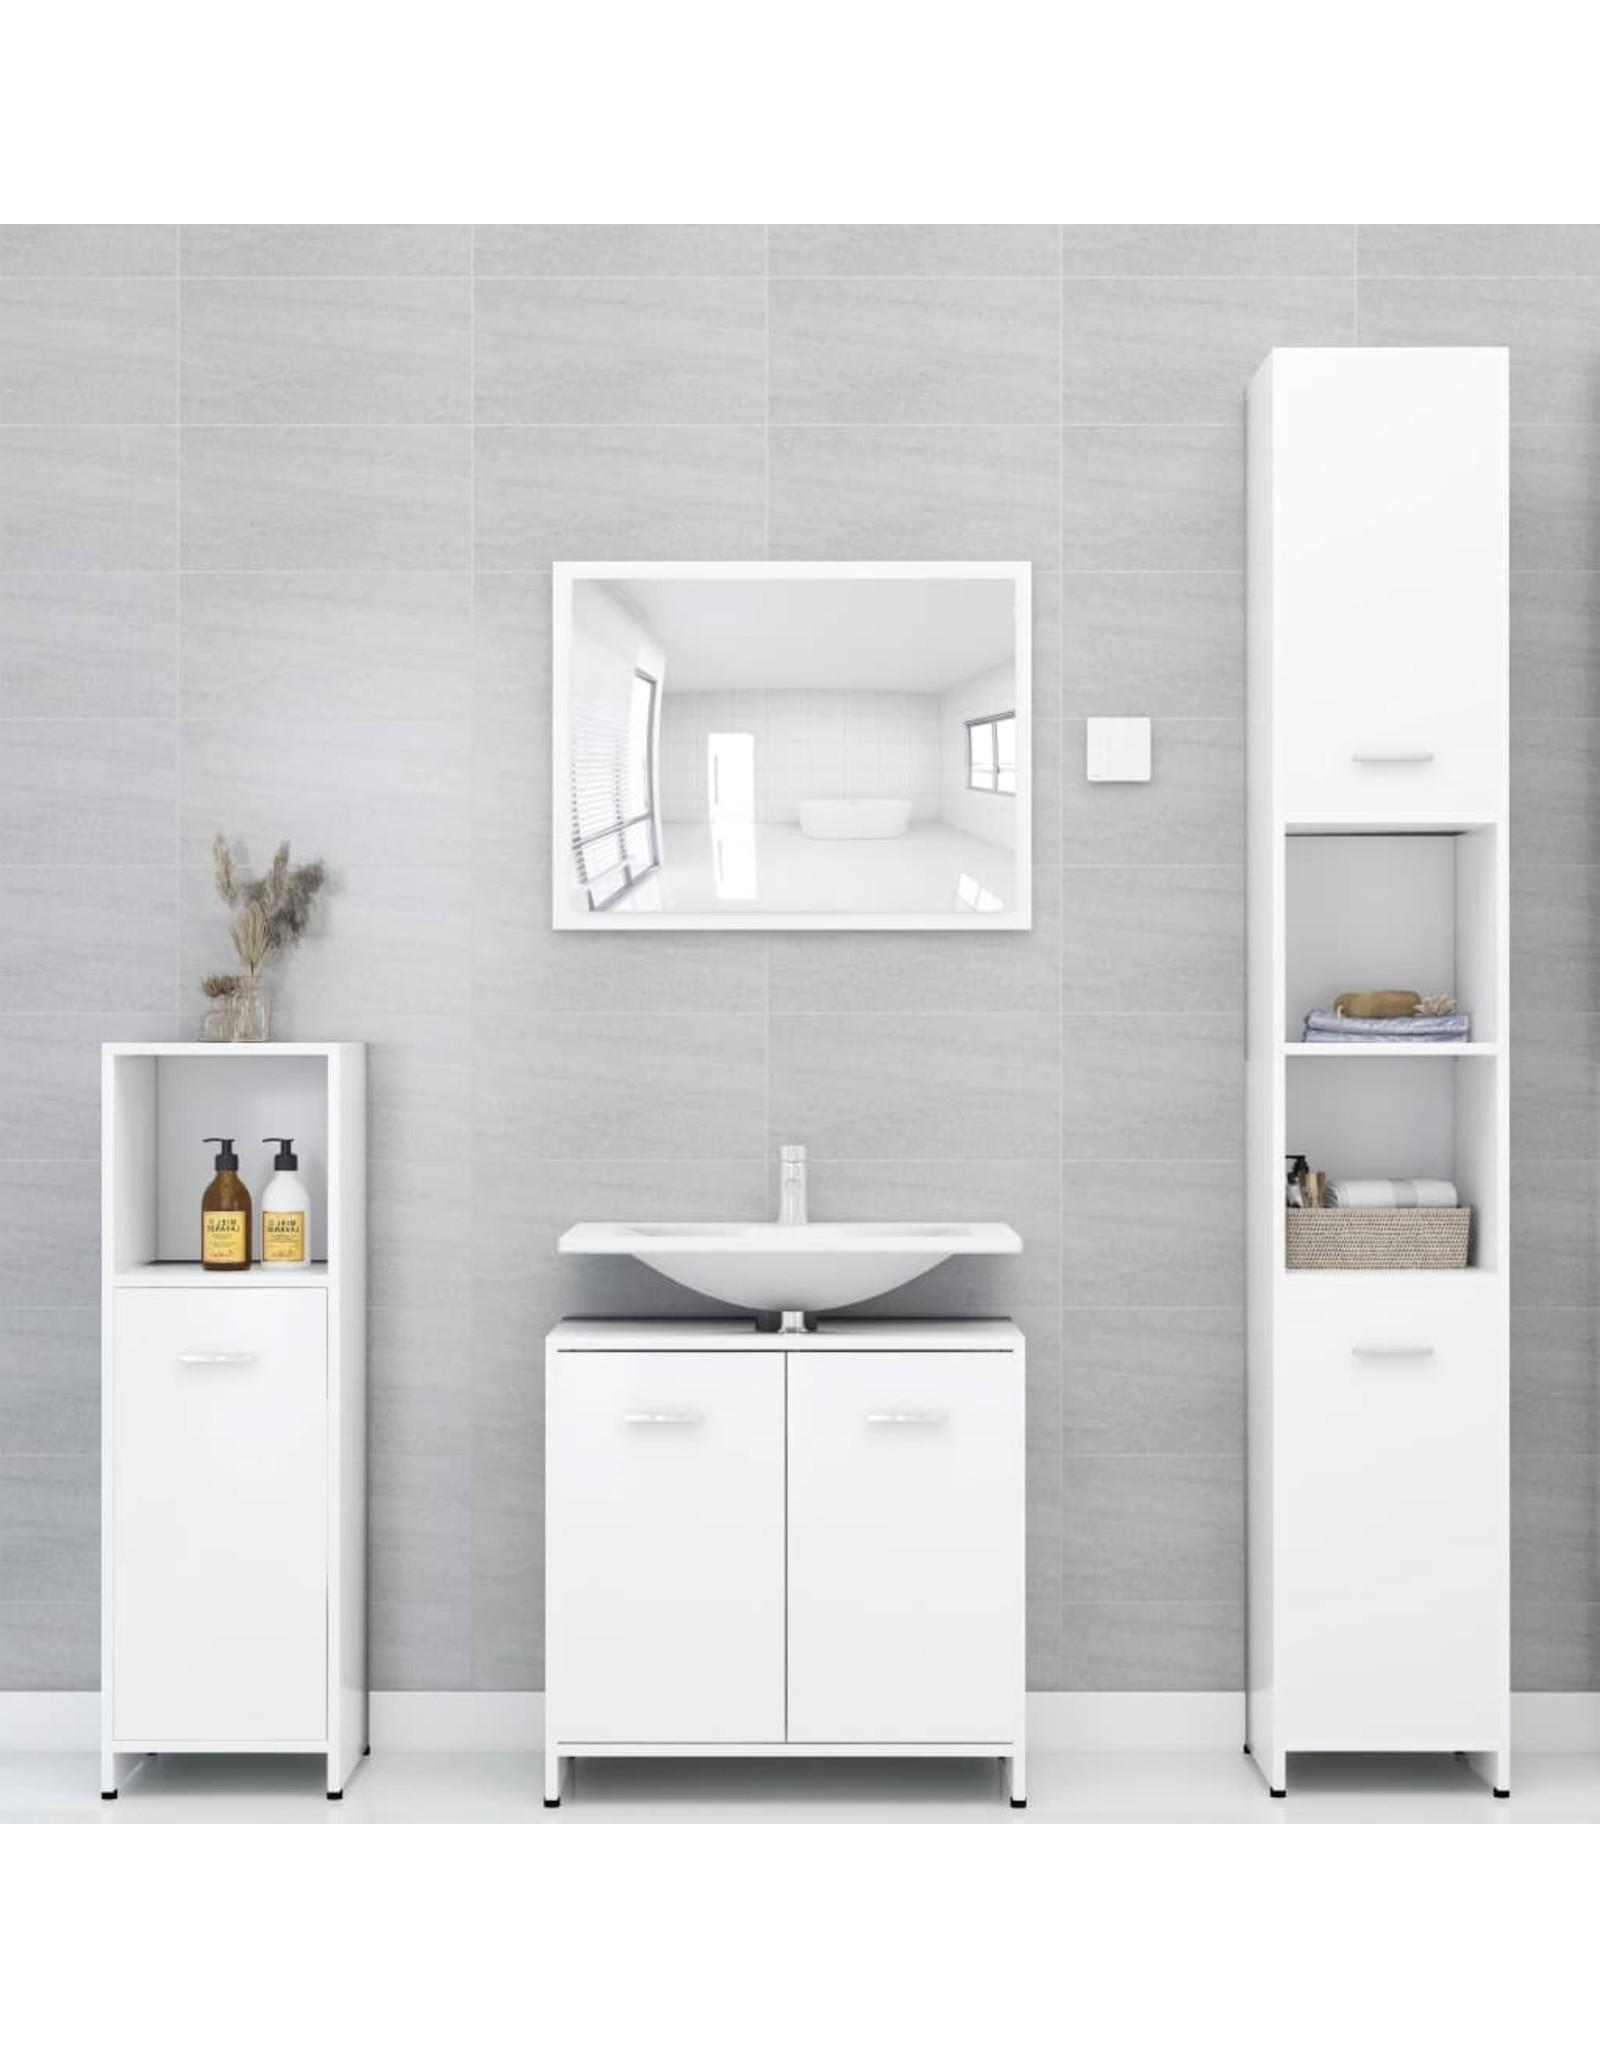 3-delige Badkamermeubelset spaanplaat wit